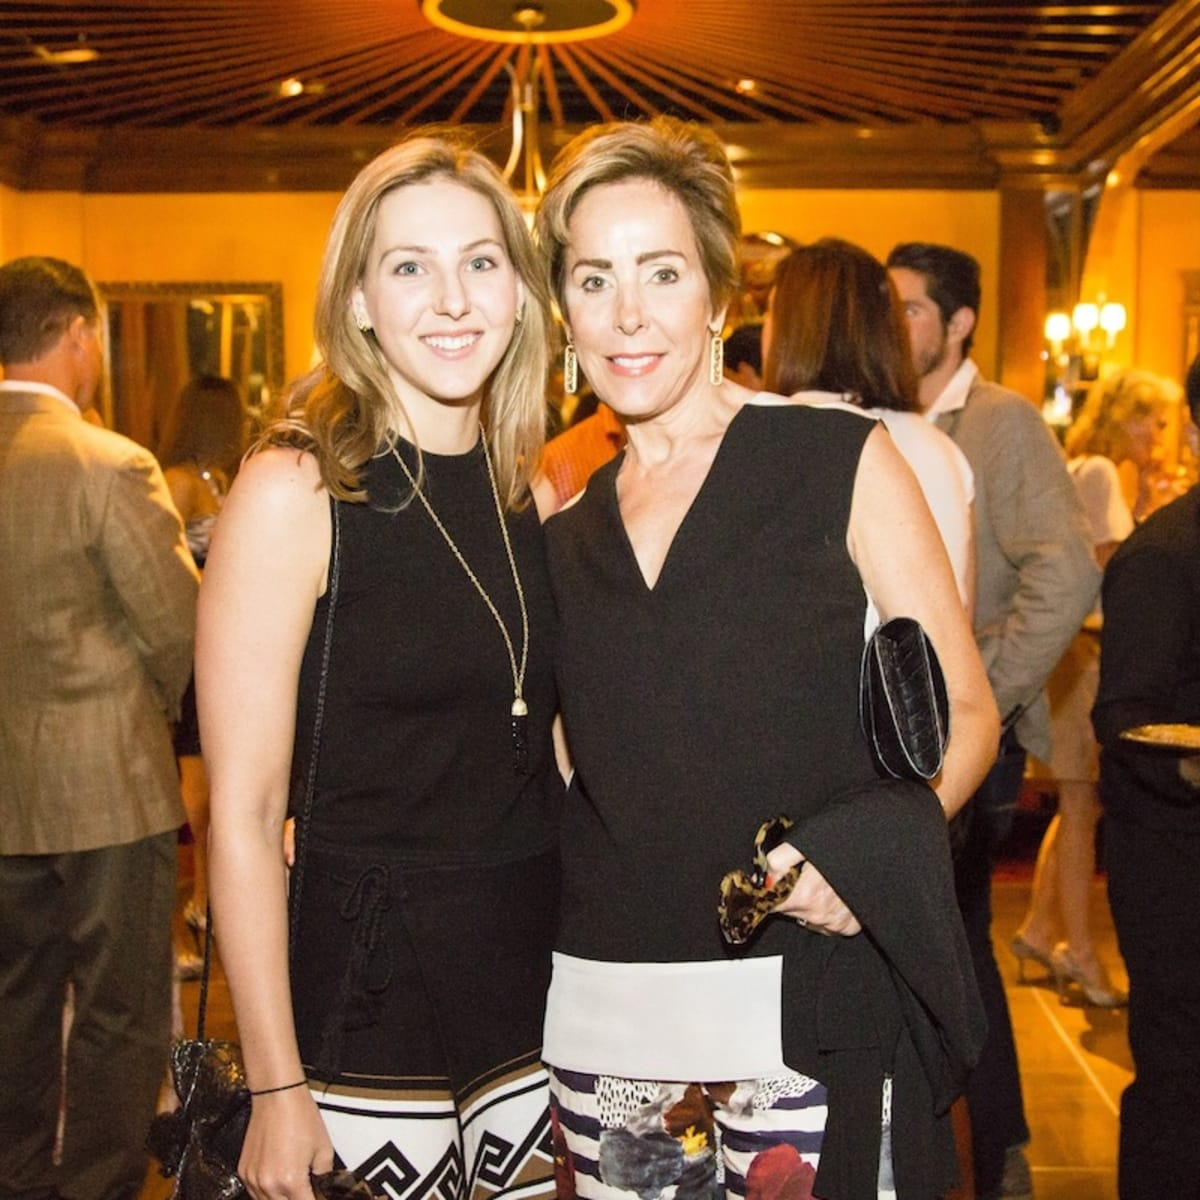 News, Shelby, Beth Muecke b'day, Oct. 2015,  Katie Currie, Liz Decker